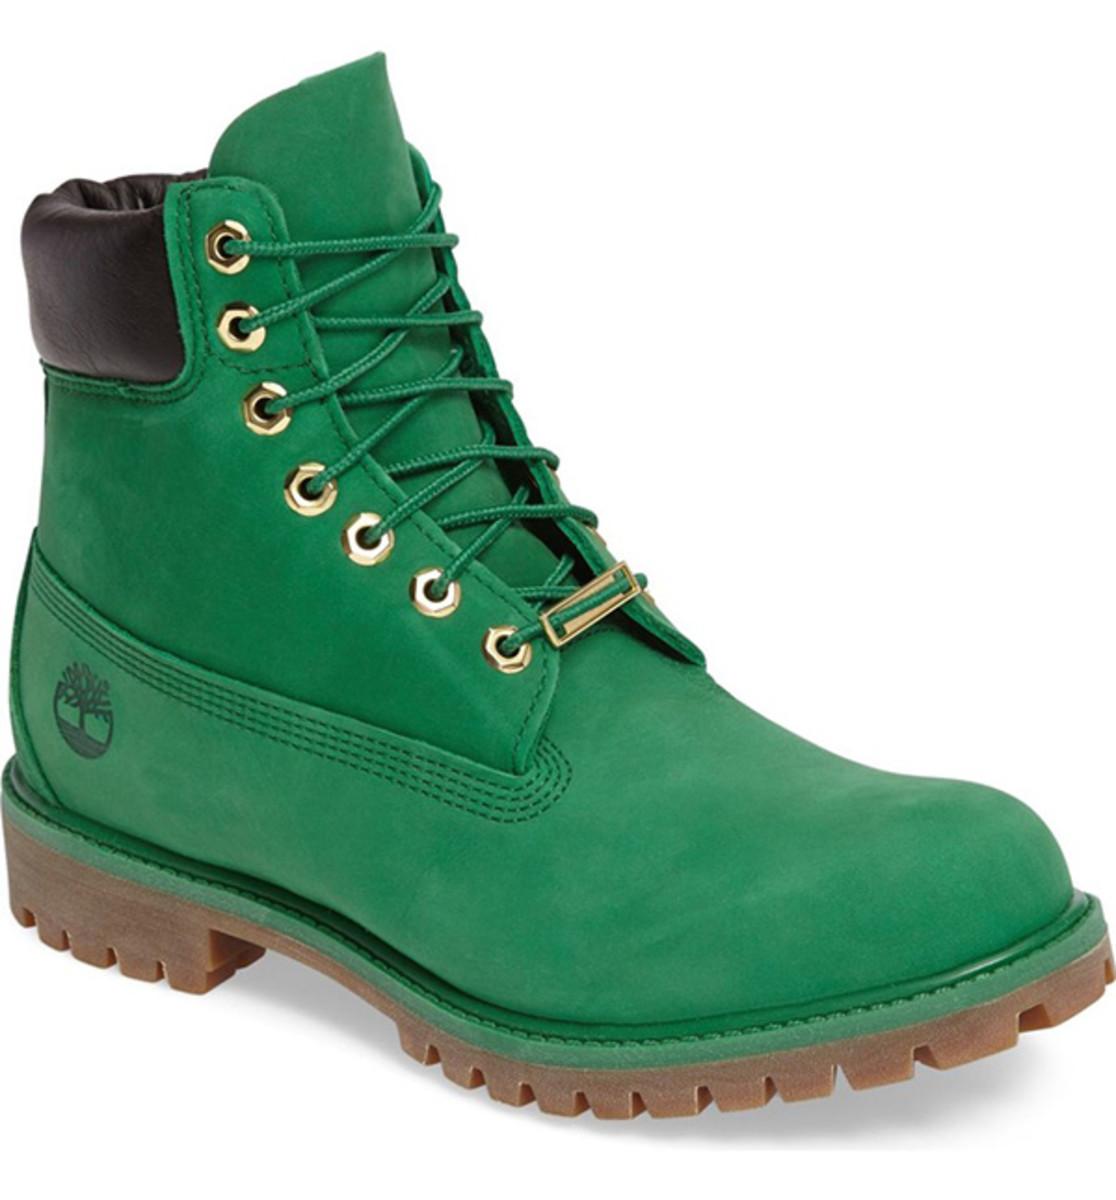 timberland-boots-green-stpatricks.jpg